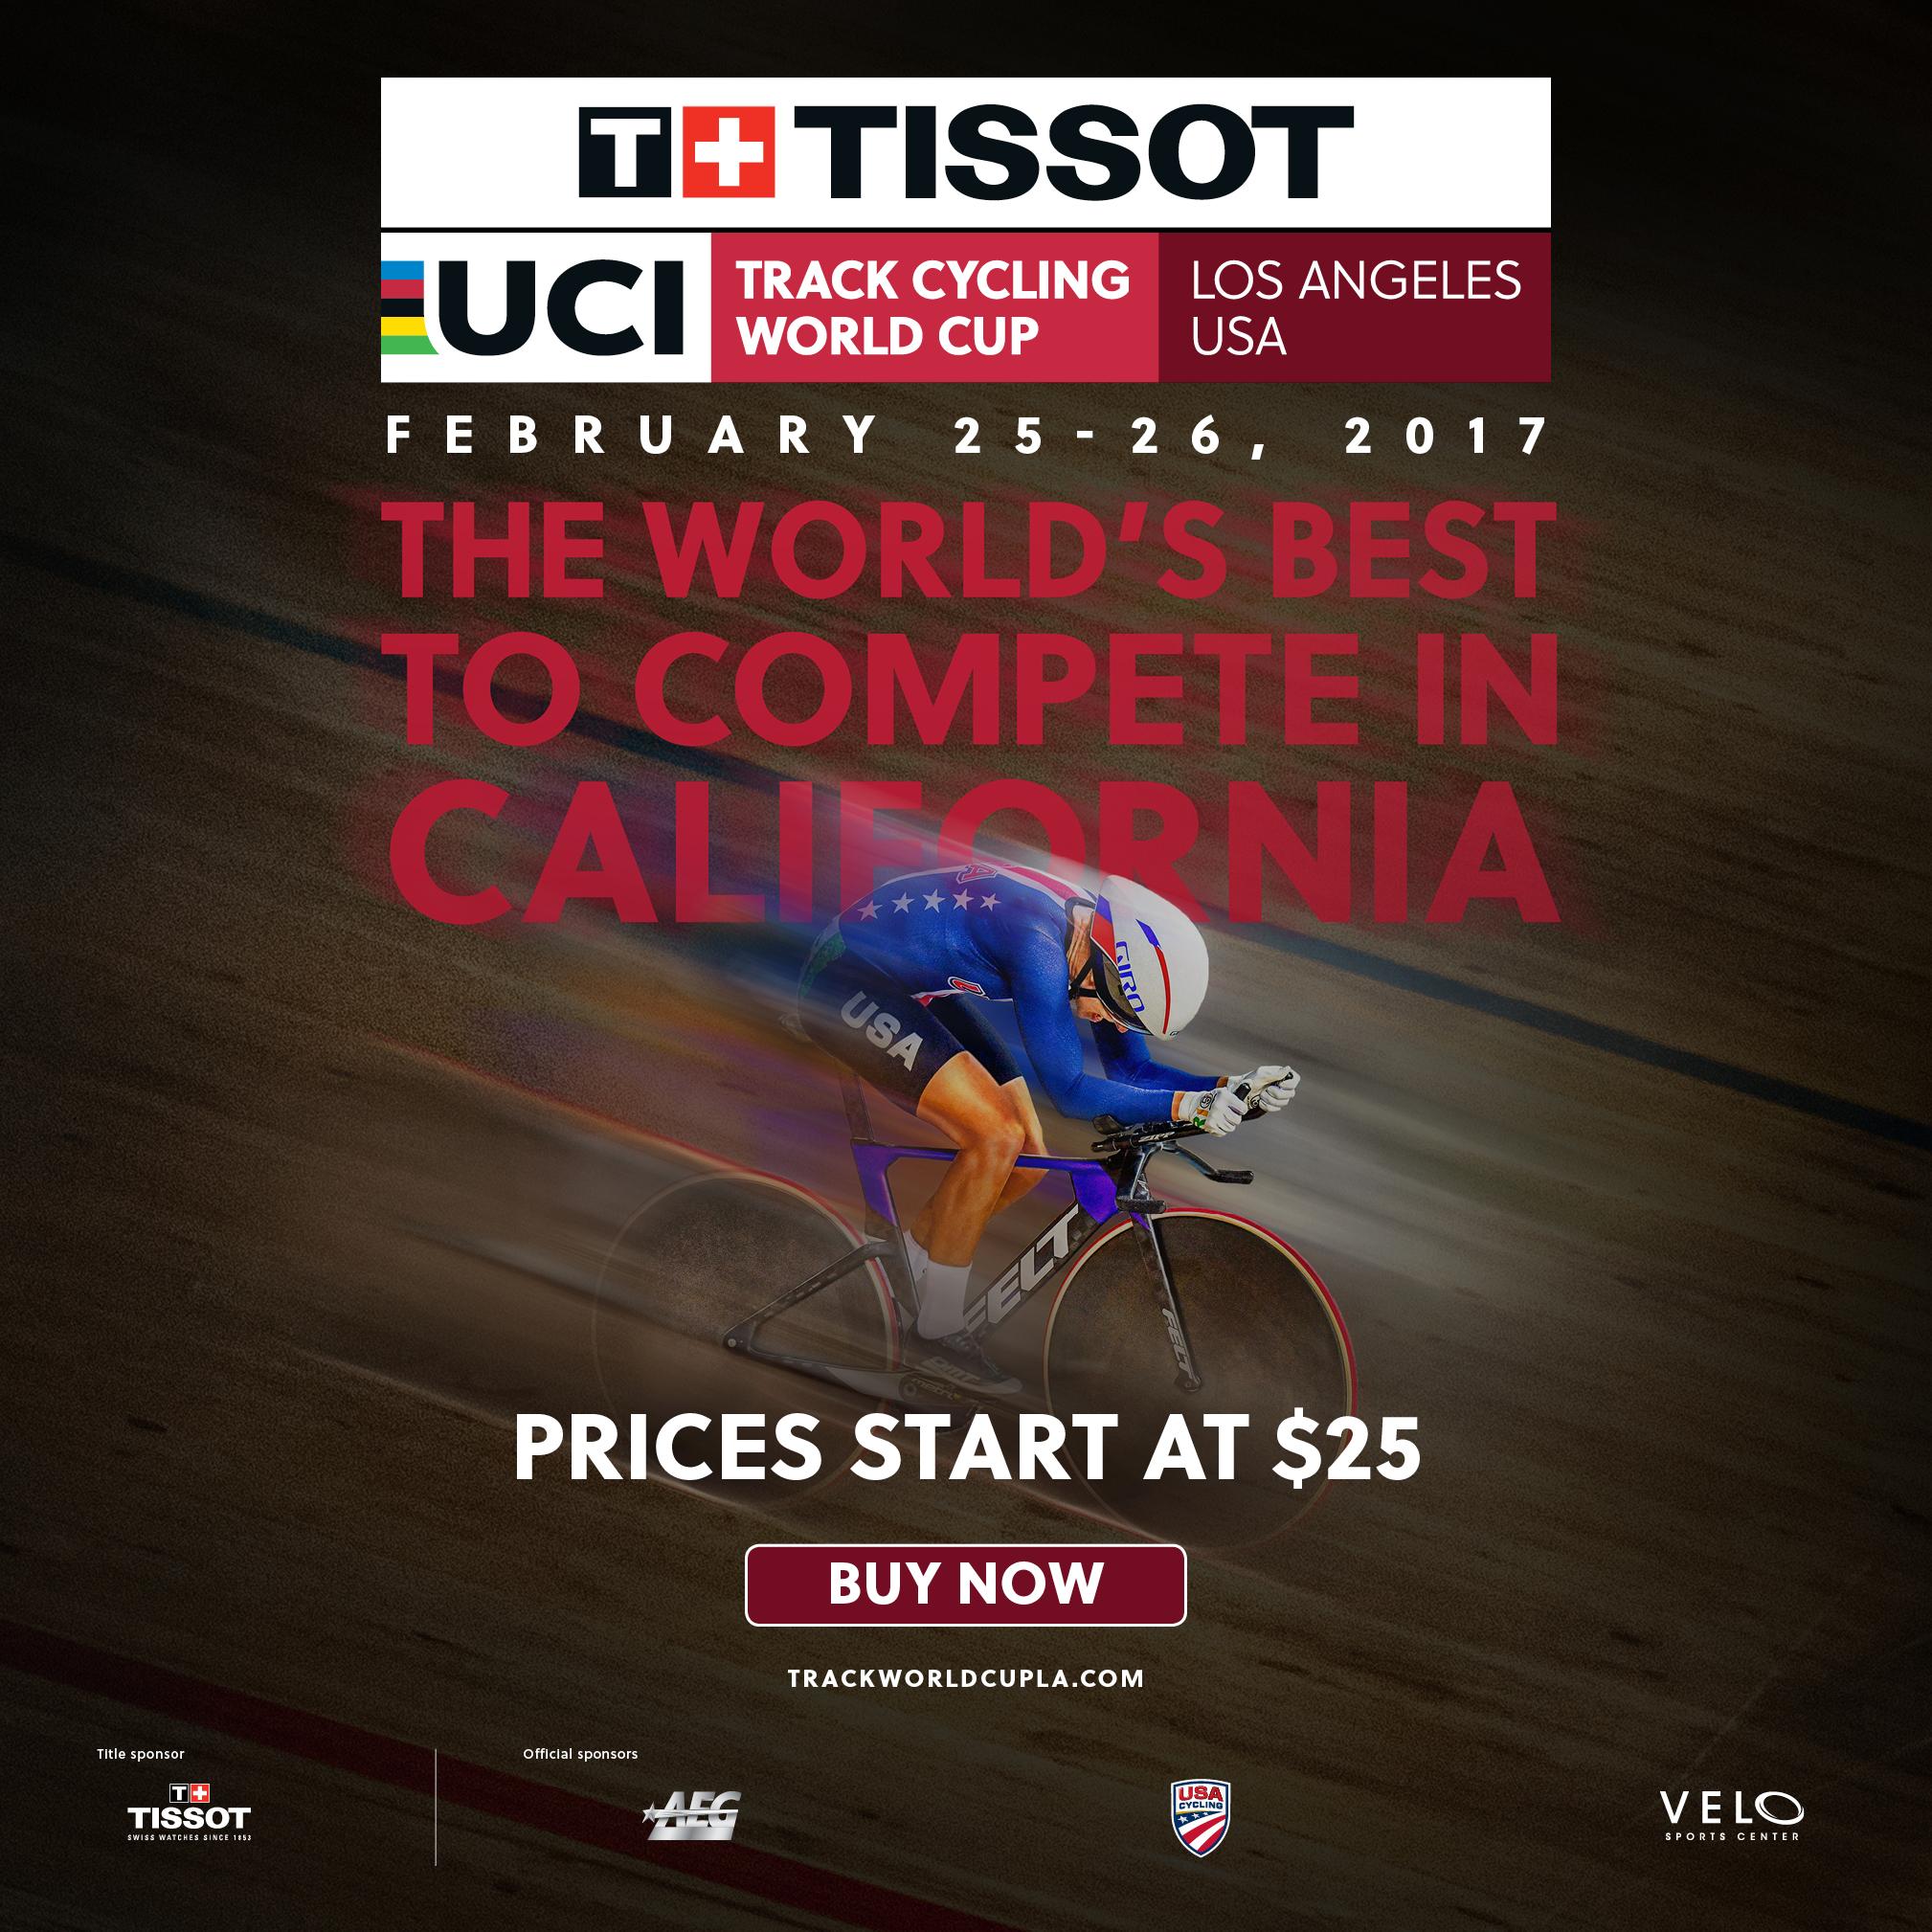 11778_TC_UCI_WORLDCUP_2000x2000_v6.jpg